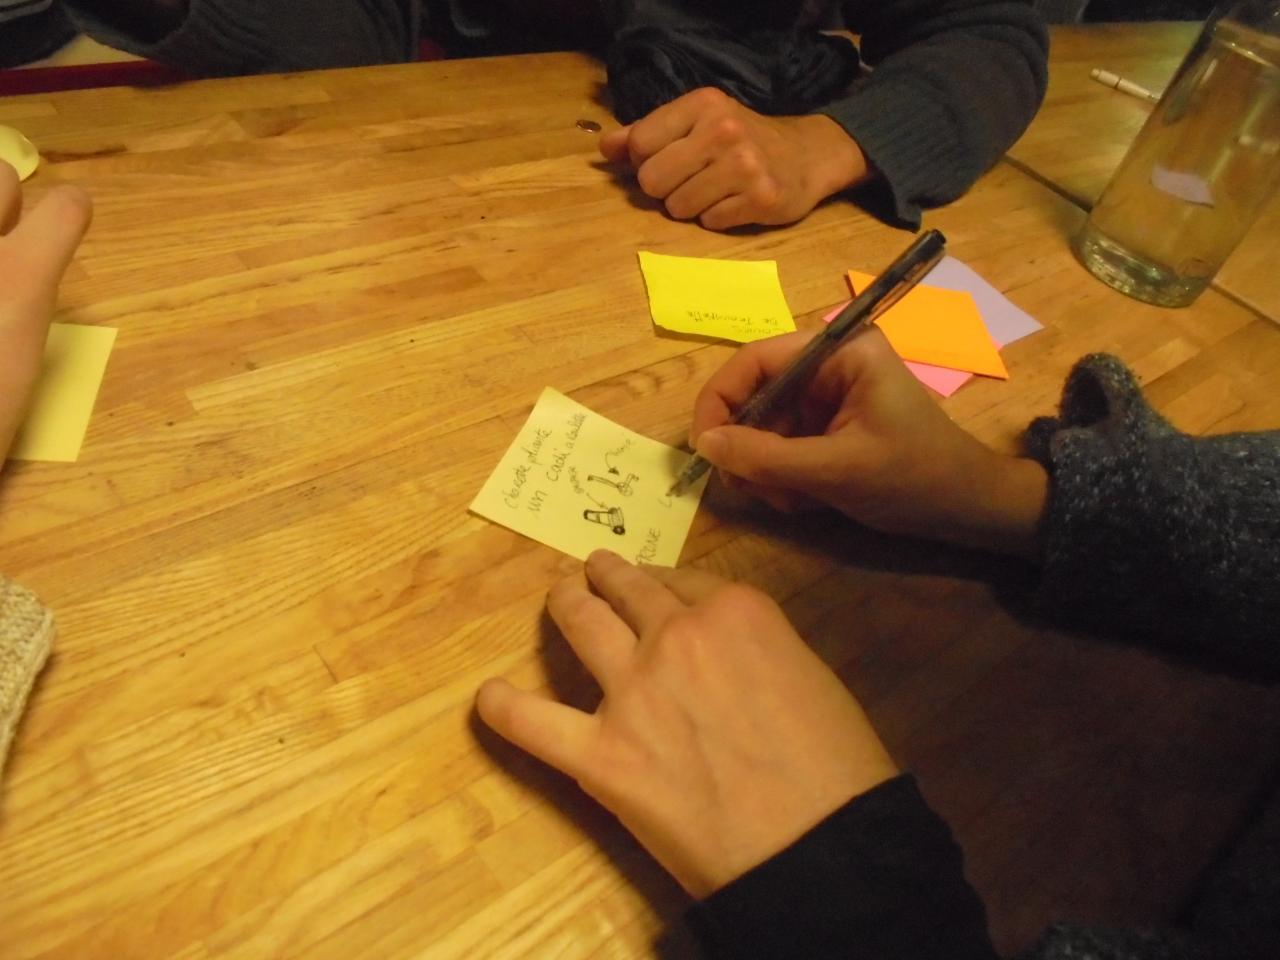 PariSolidari-Troc au Moulin à Café 05/10/2016